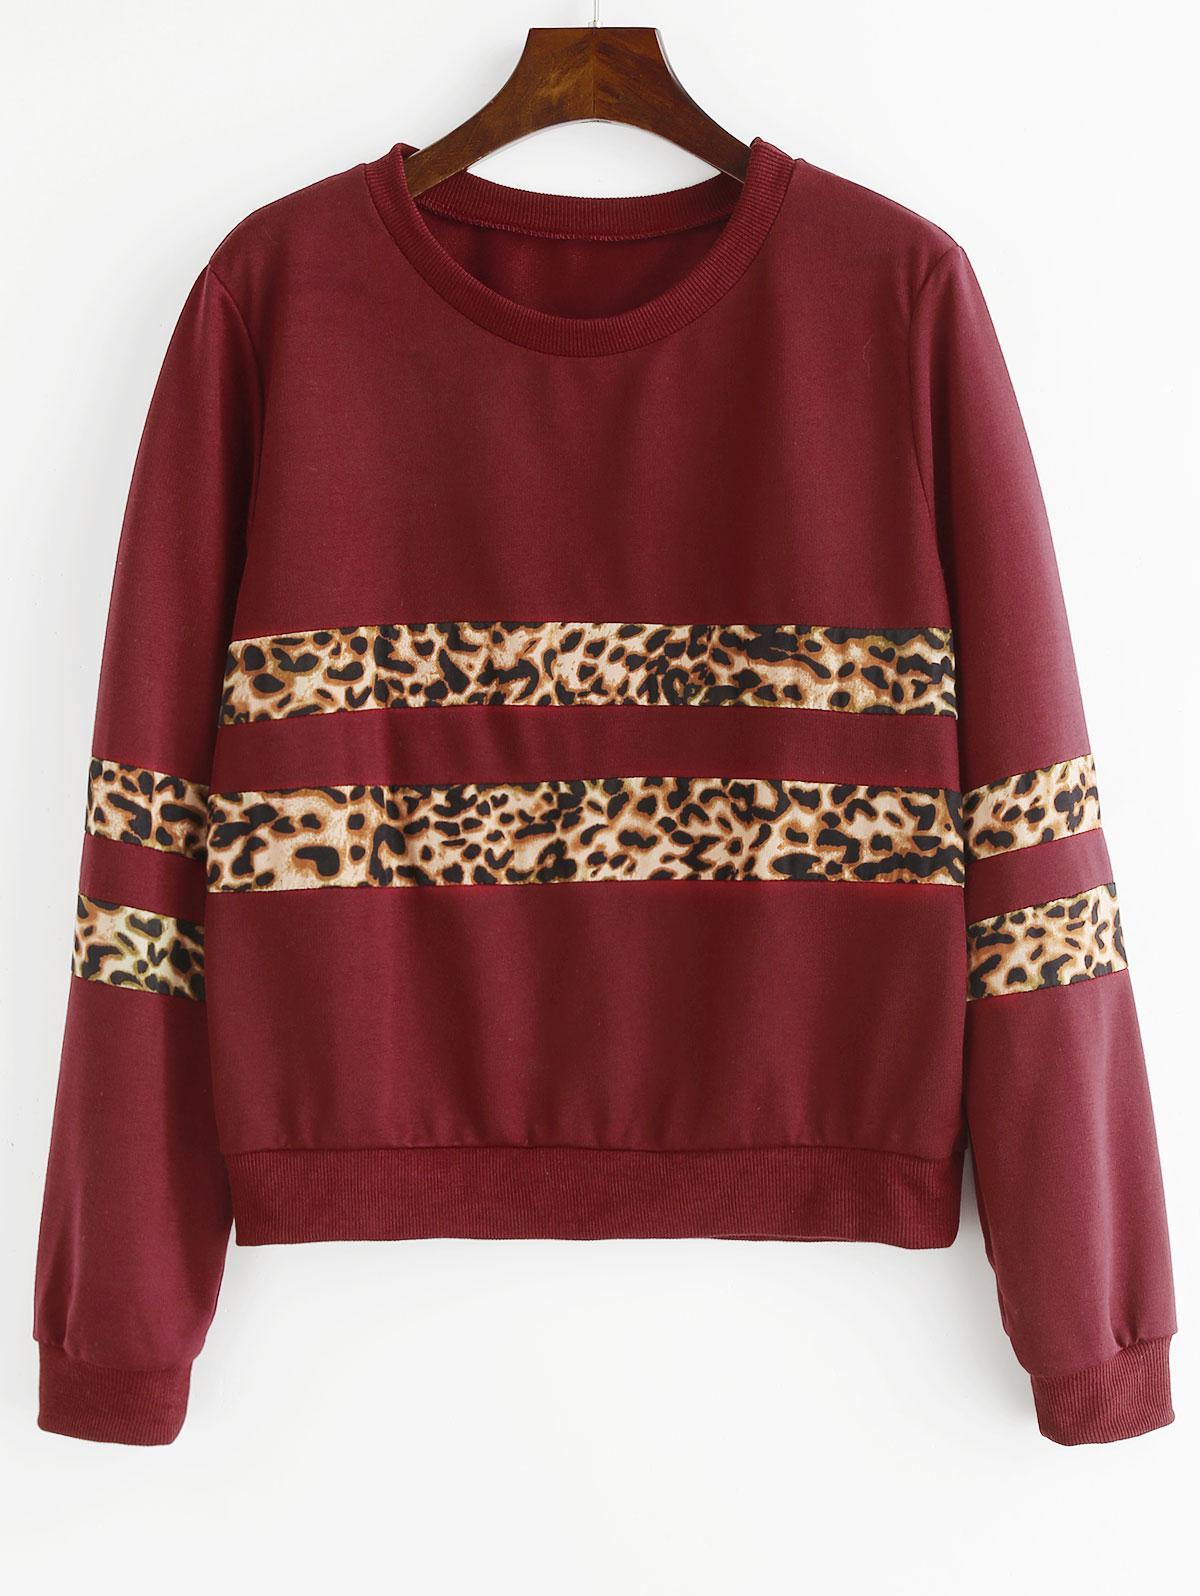 Zaful   RED WINE Leopard Paneled Sweatshirt   Clouty